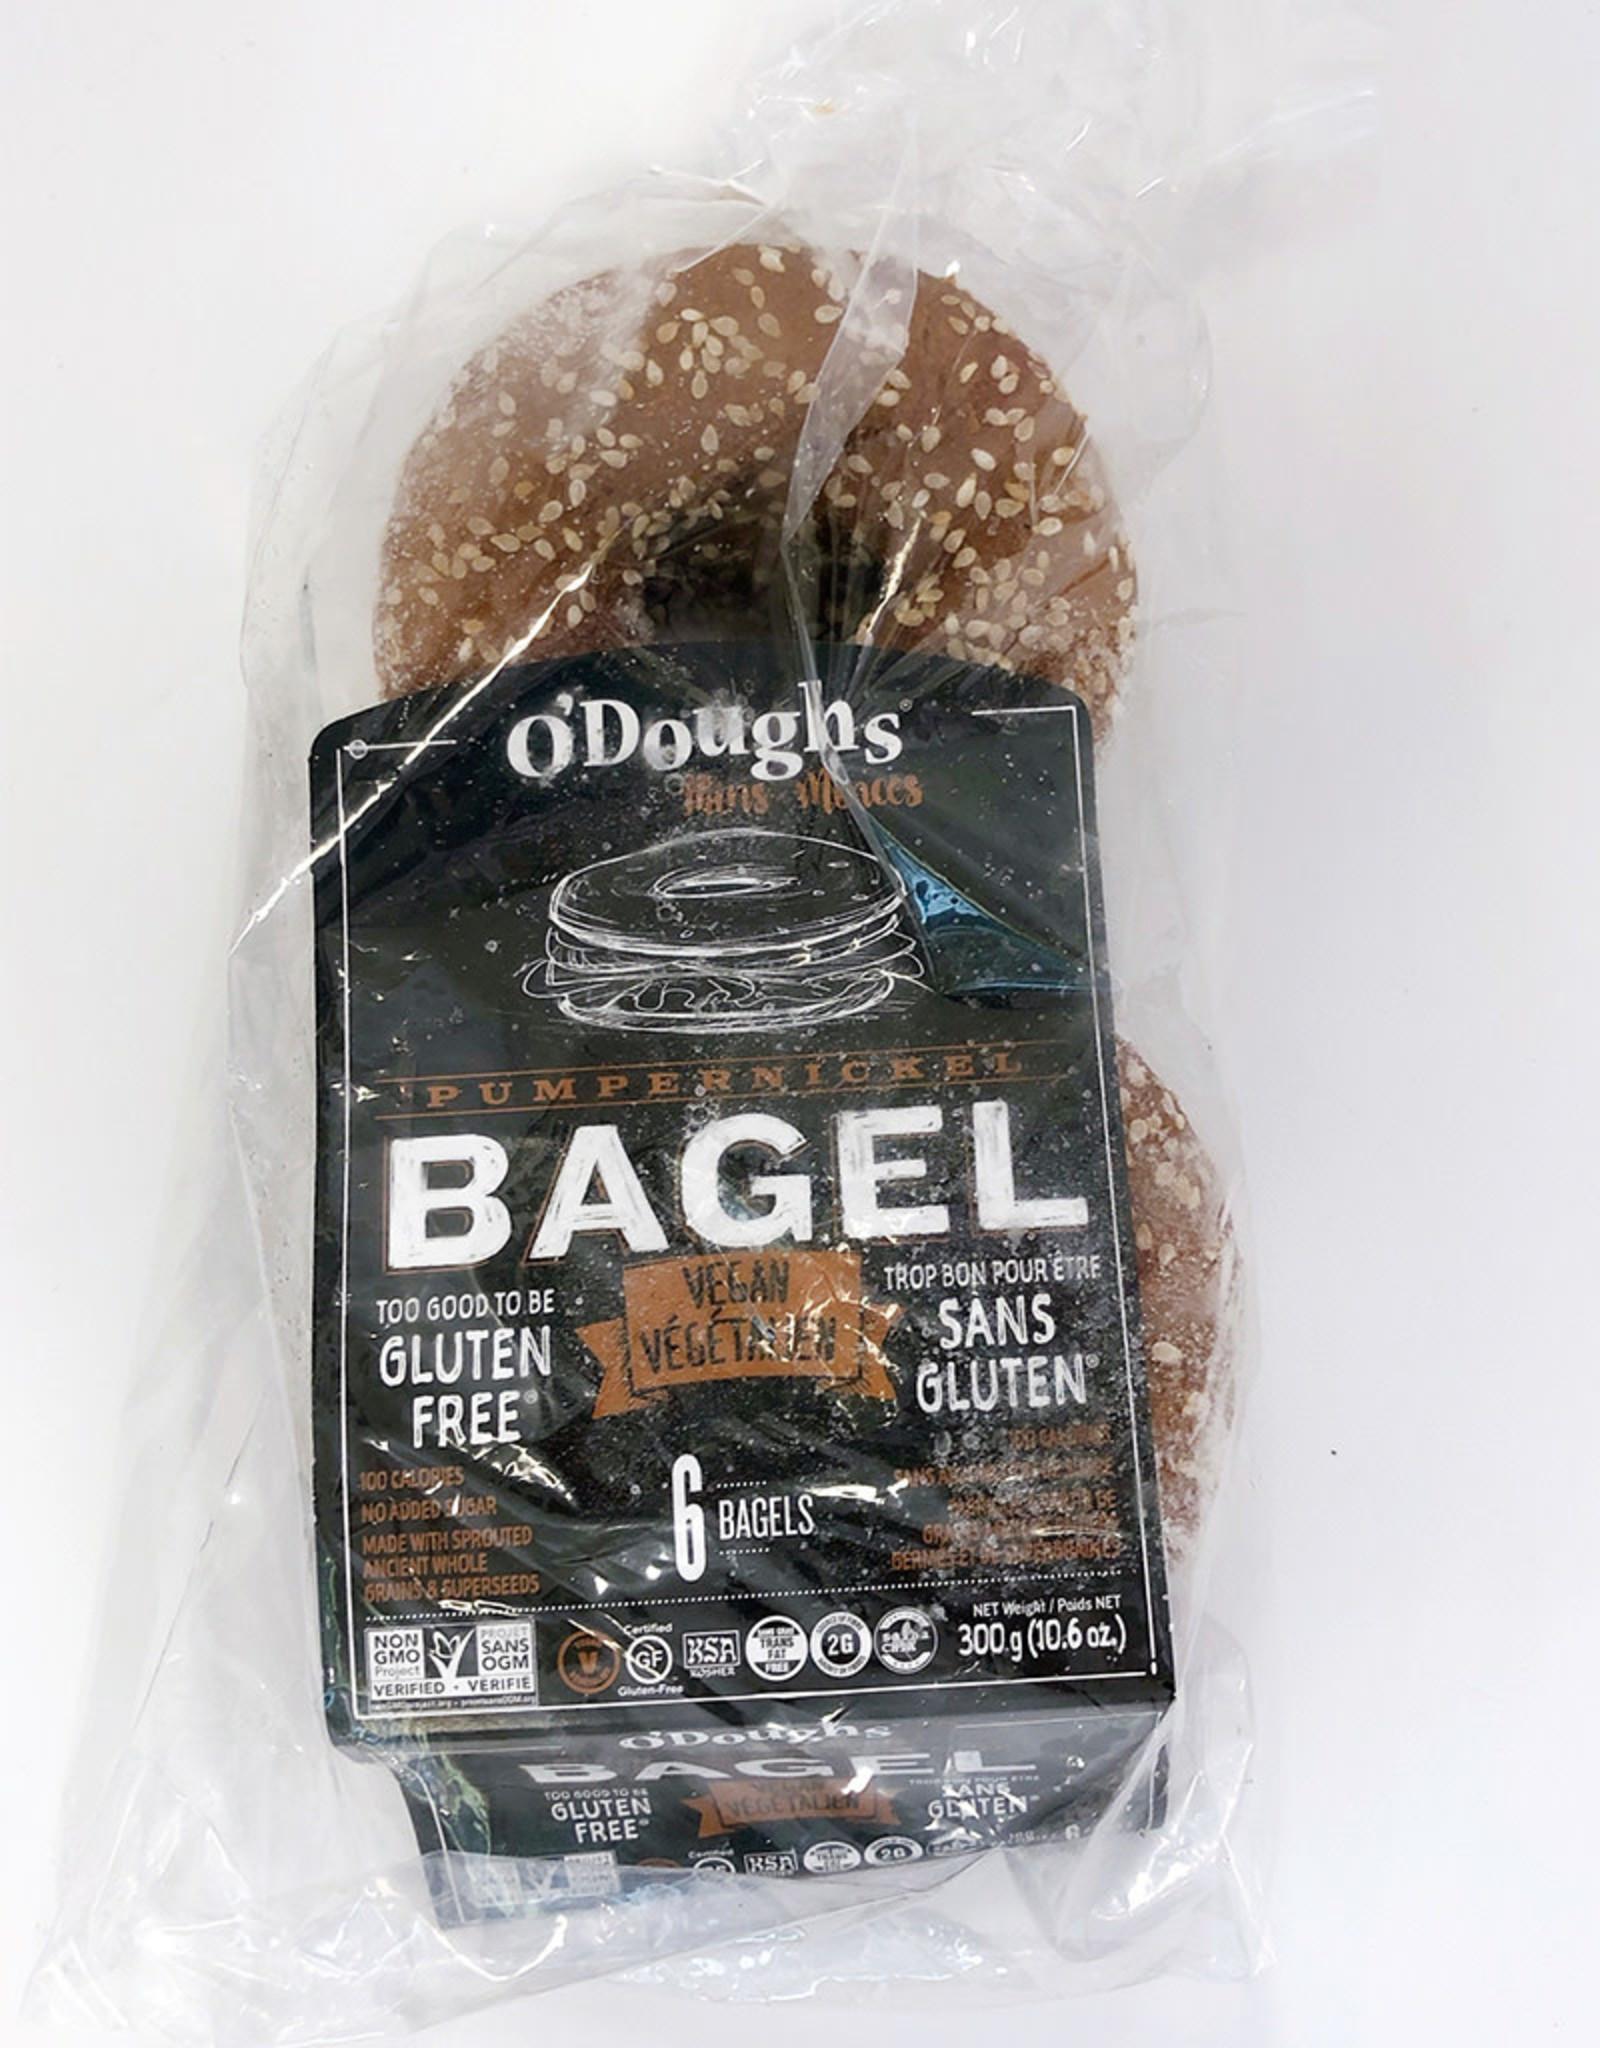 O'Doughs ODoughs - Bagels, Pumpernickel